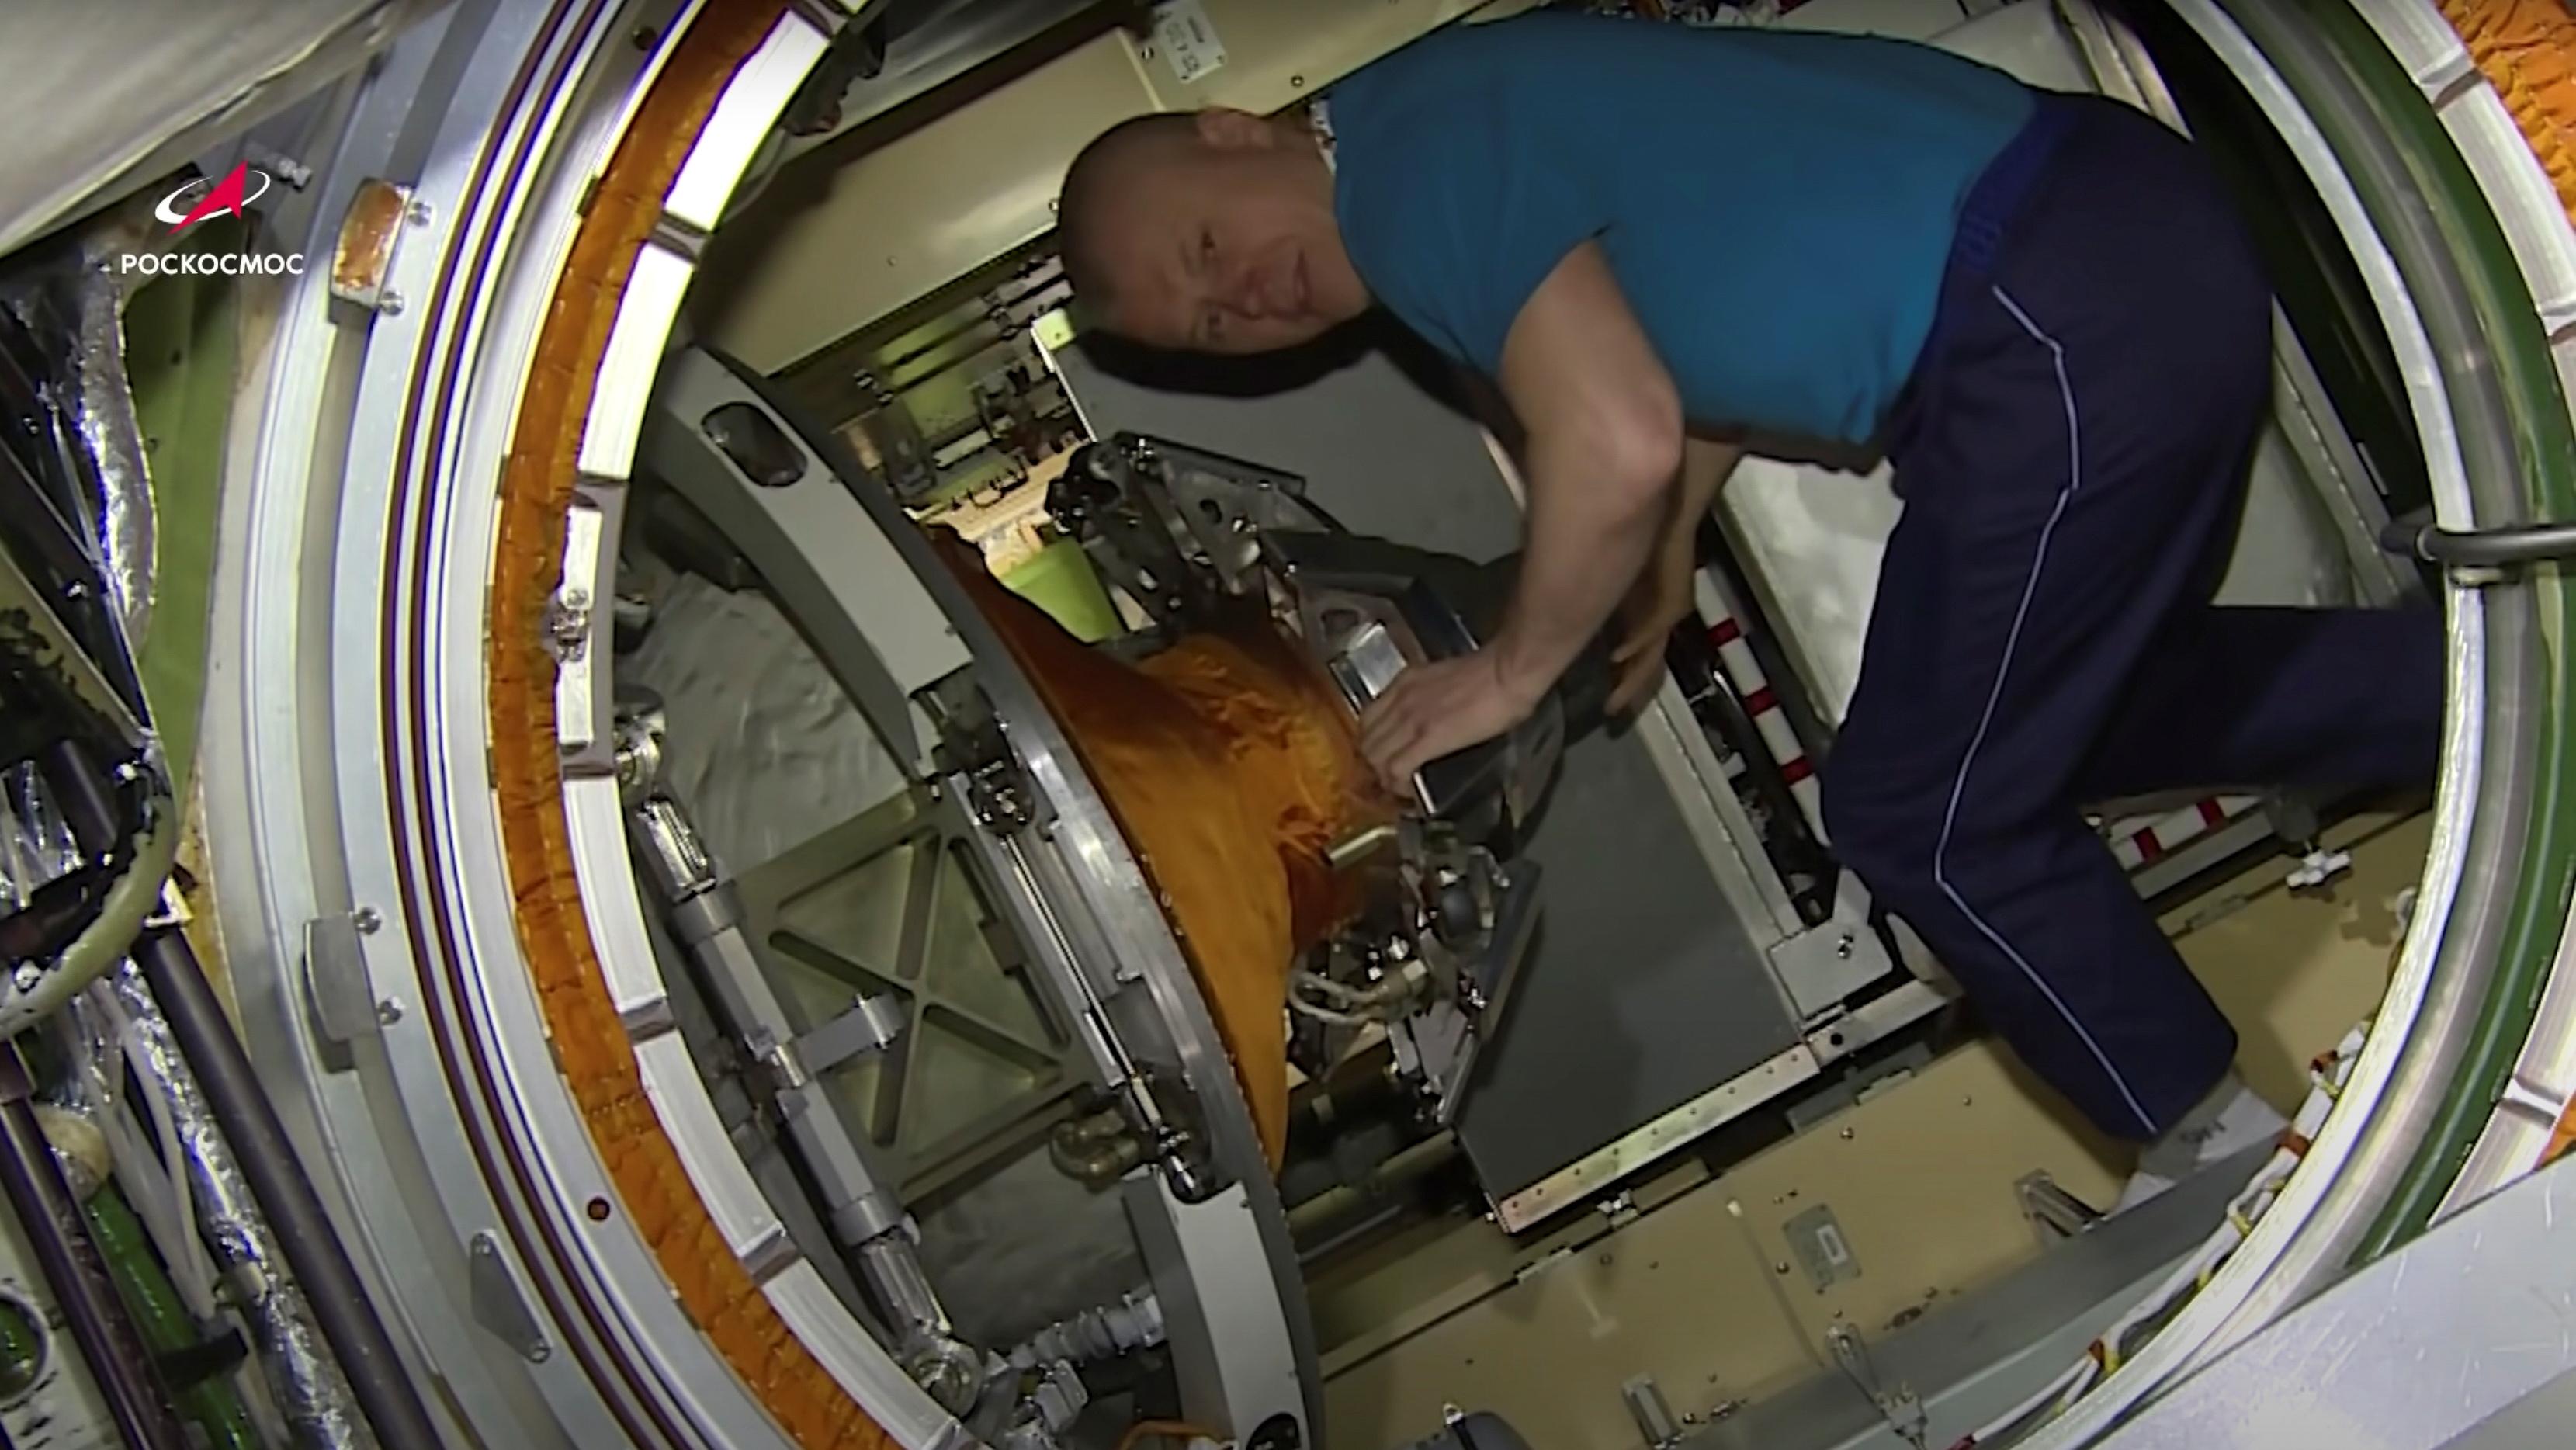 International Space Station (ISS) crew member, Roscosmos cosmonaut Oleg Novitskiy, is seen inside the Nauka (Science) Multipurpose Laboratory Module on July 31, 2021 in this still image taken from video. Image taken July 31, 2021. Roscosmos/Handout via REUTERS